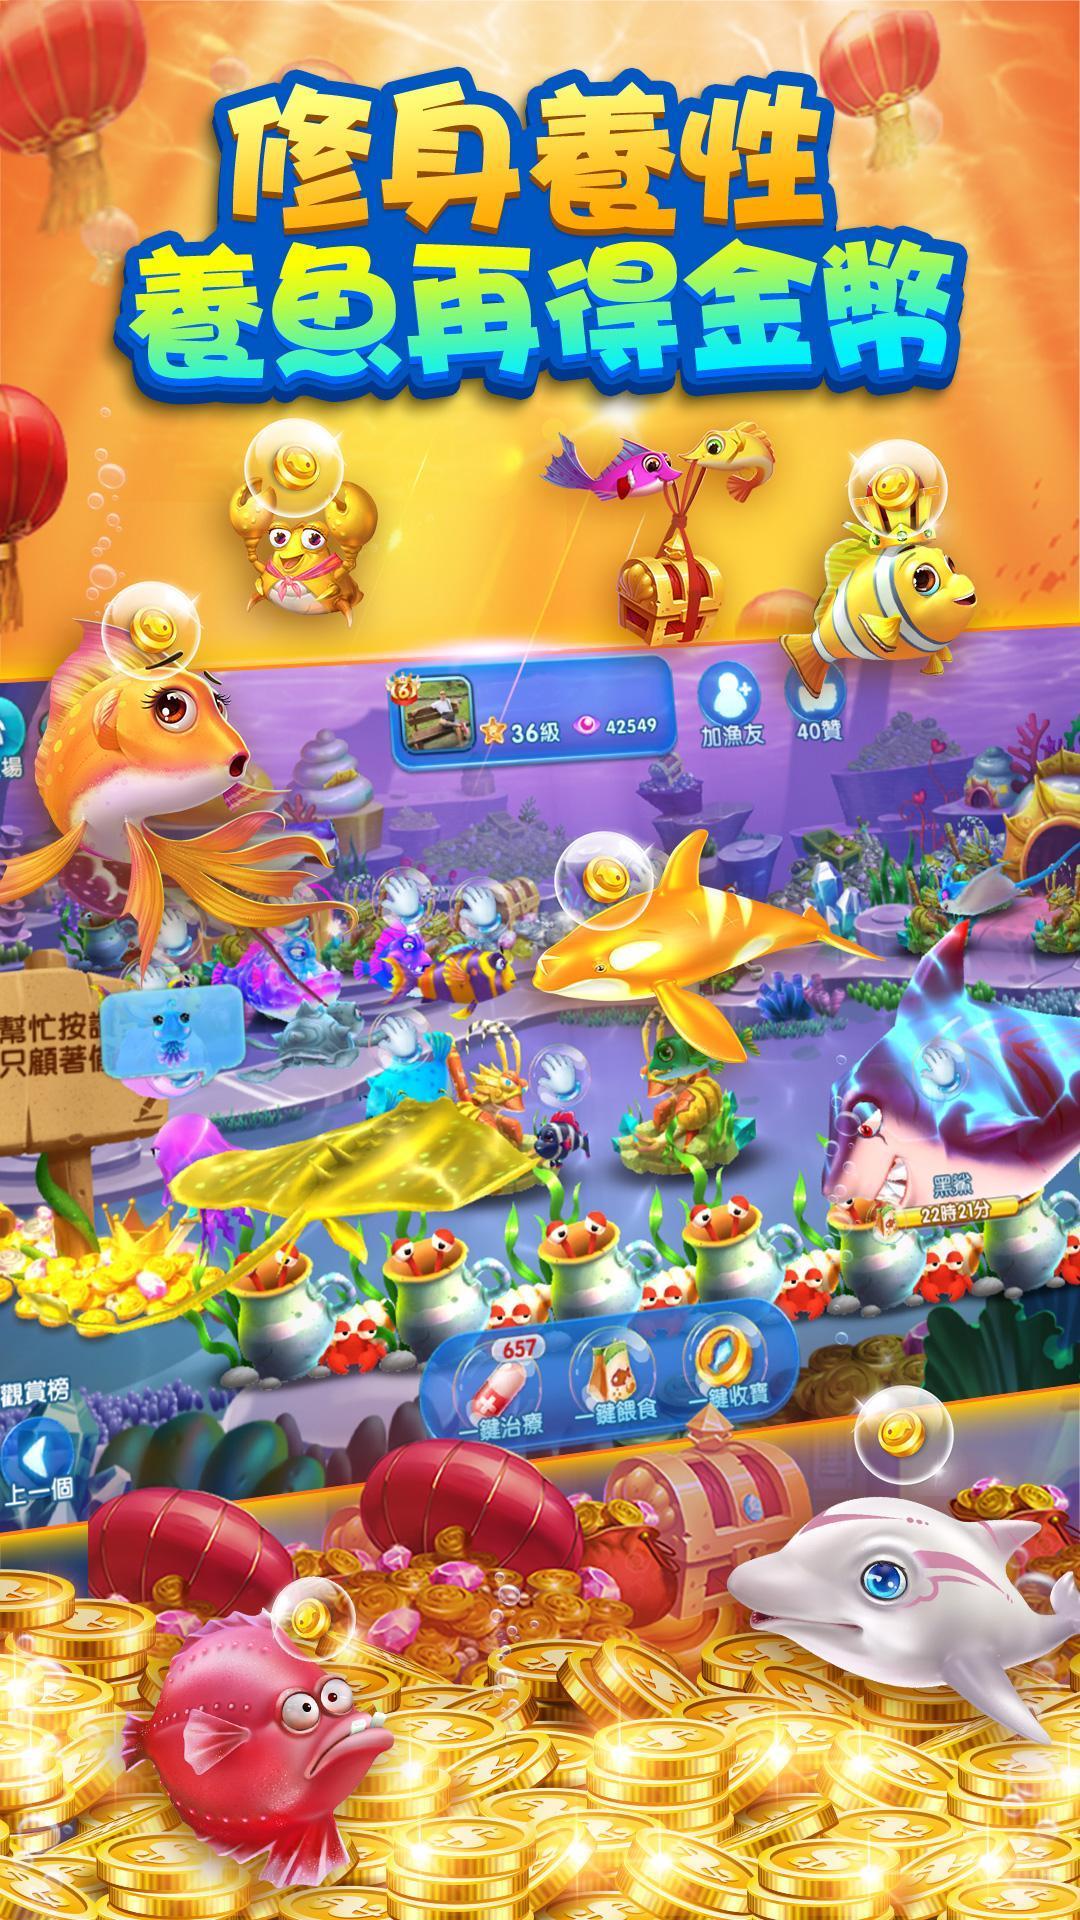 Fish is Coming: Best 3D Arcade 1.16.2 Screenshot 5